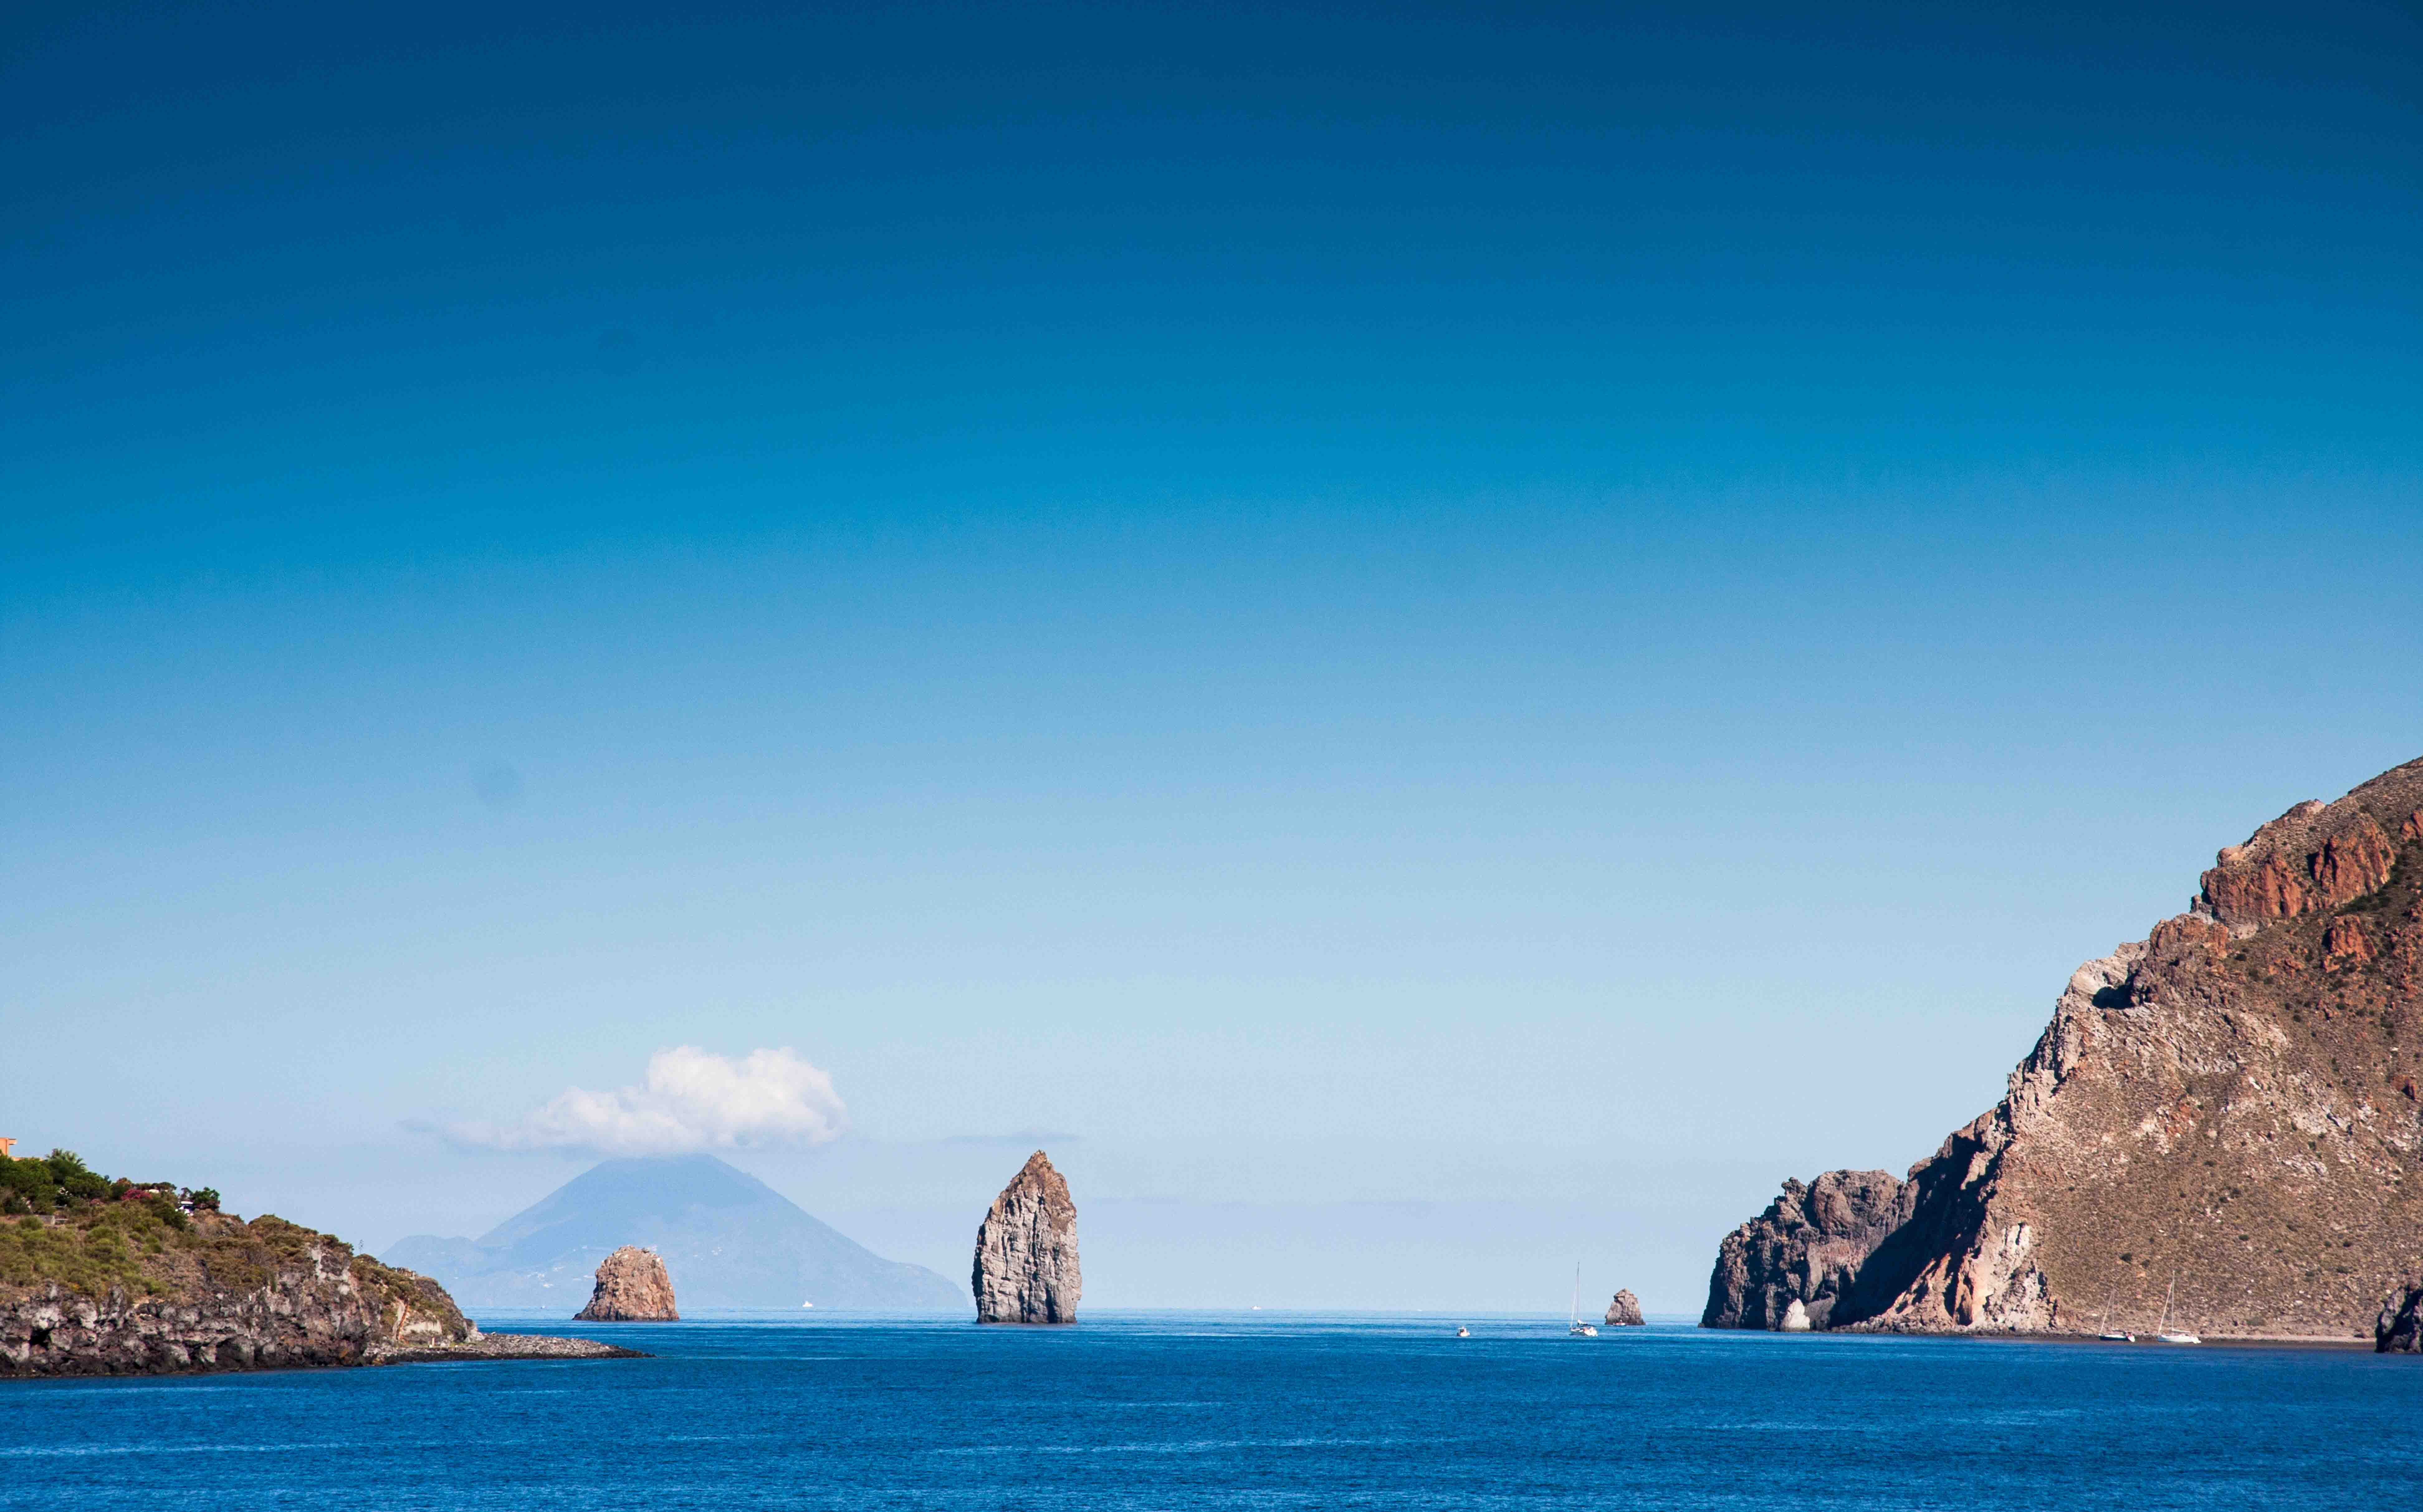 isole-eolie-lipari-salina.jpg